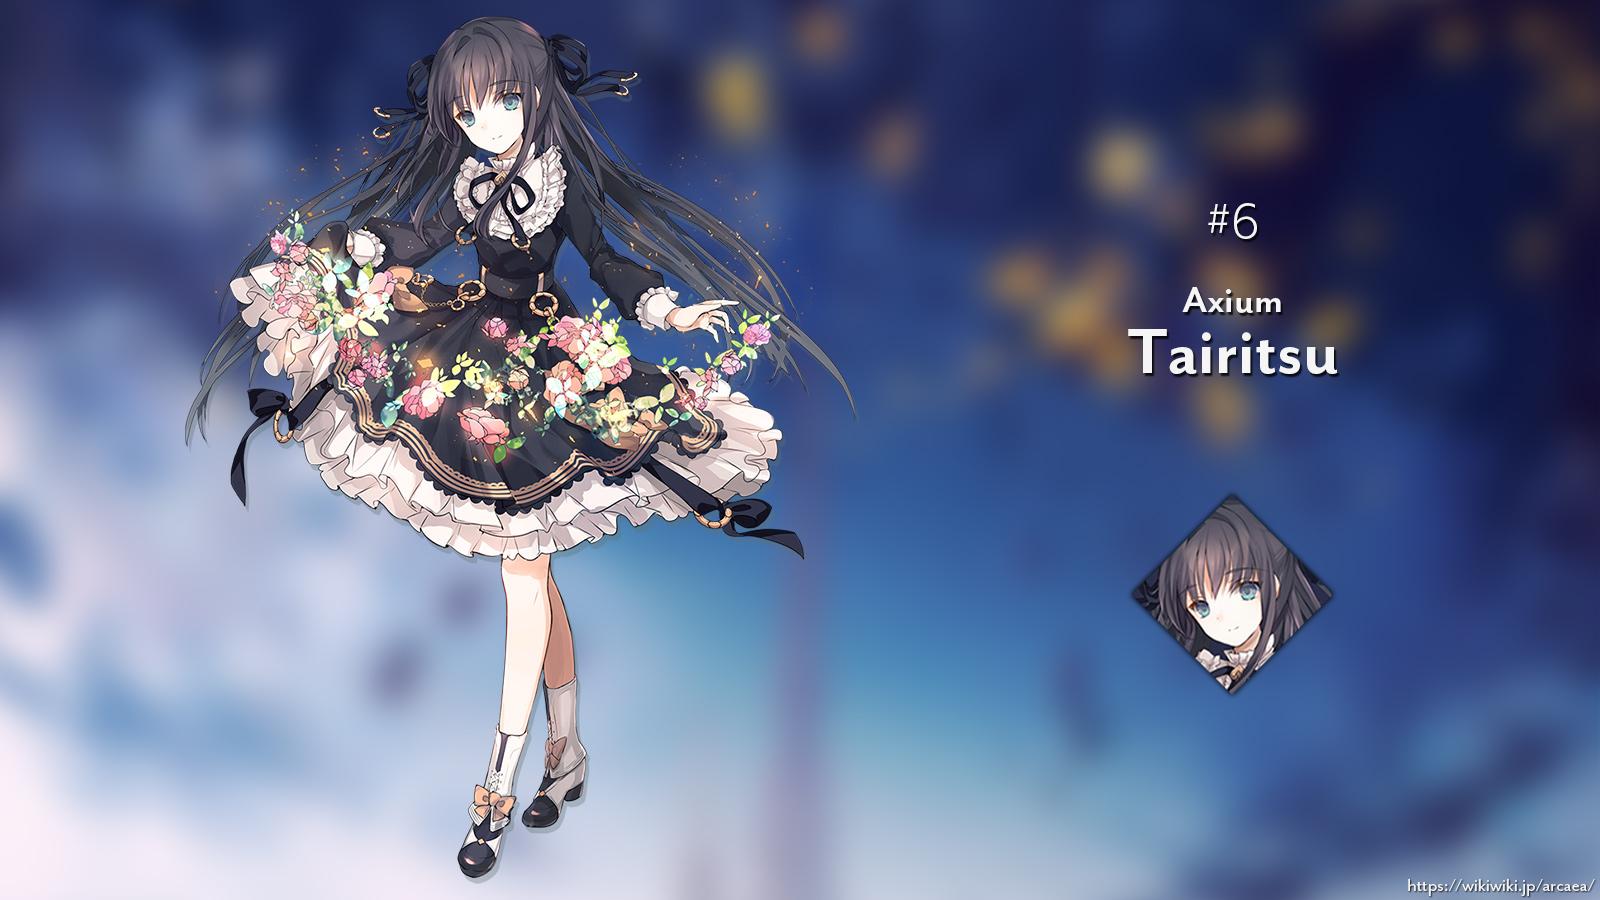 Tairitsu (Axium Crisis)